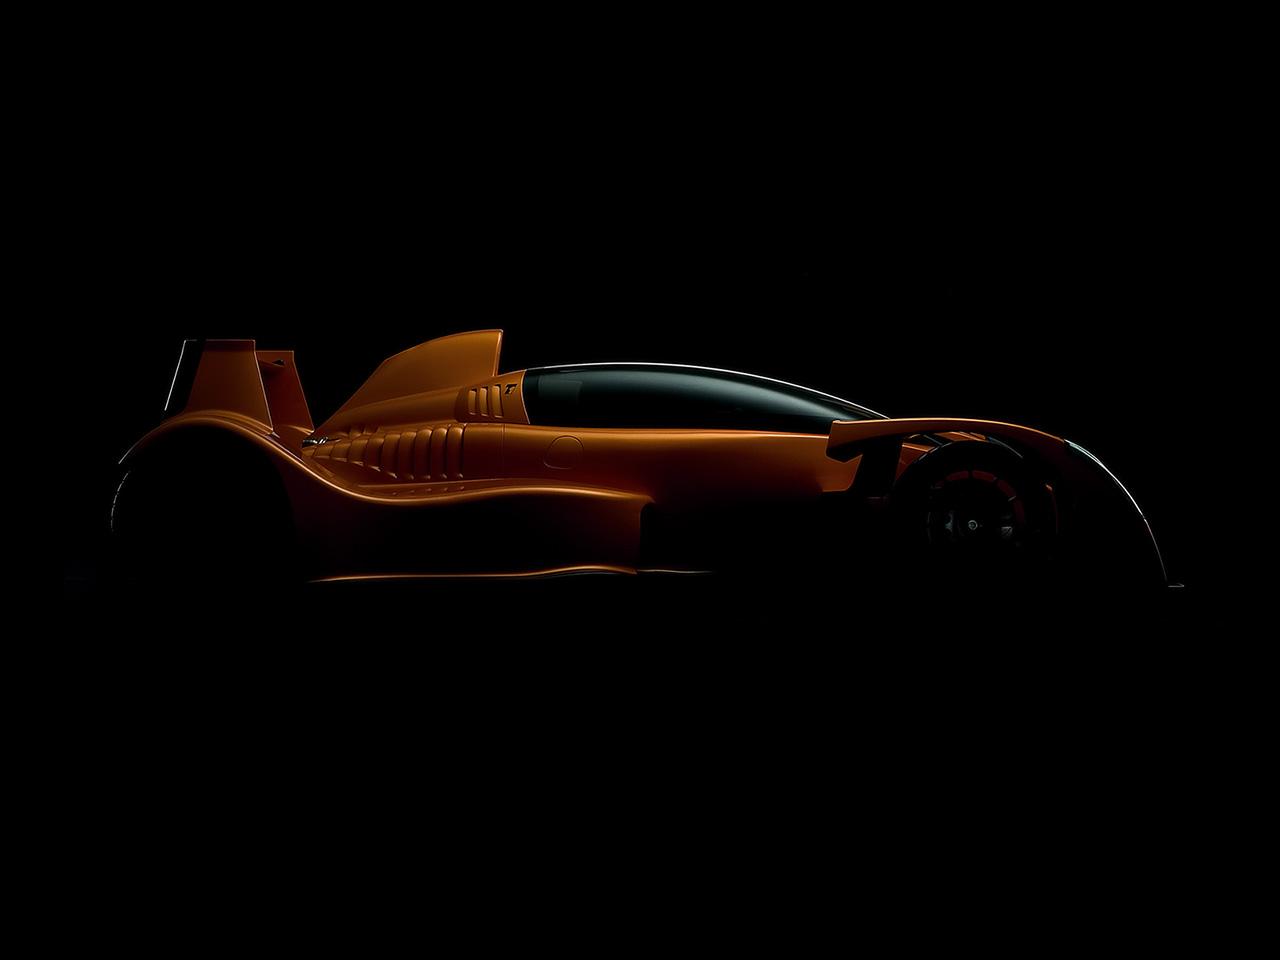 concept-car.jpg